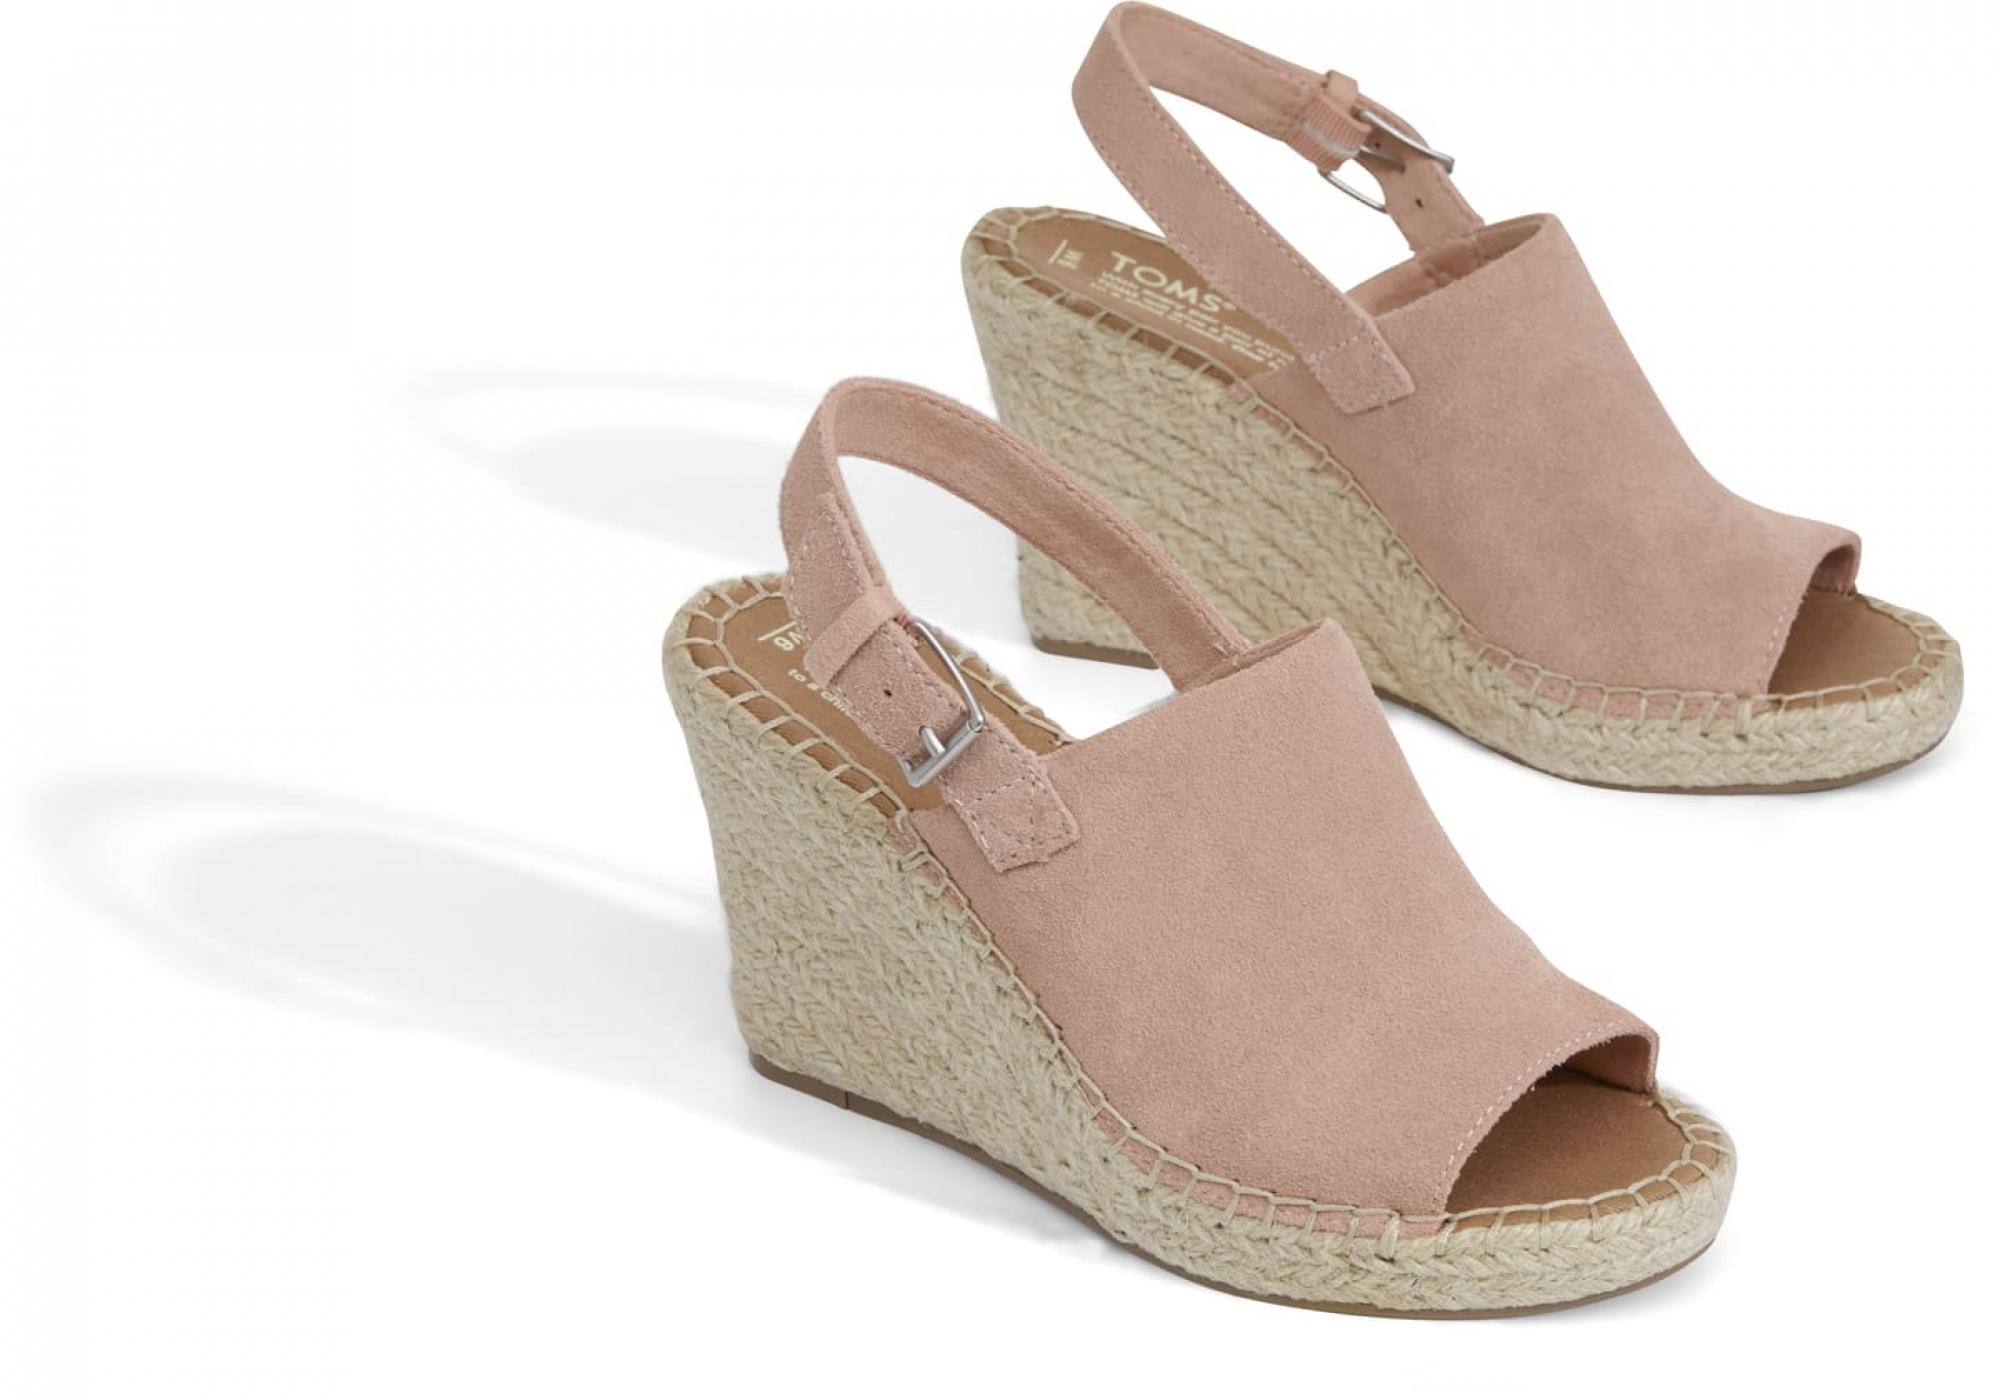 cc0b6a3476aa9 dámské růžové sandálky na klínku TOMS Suede Monica | Urbanlux